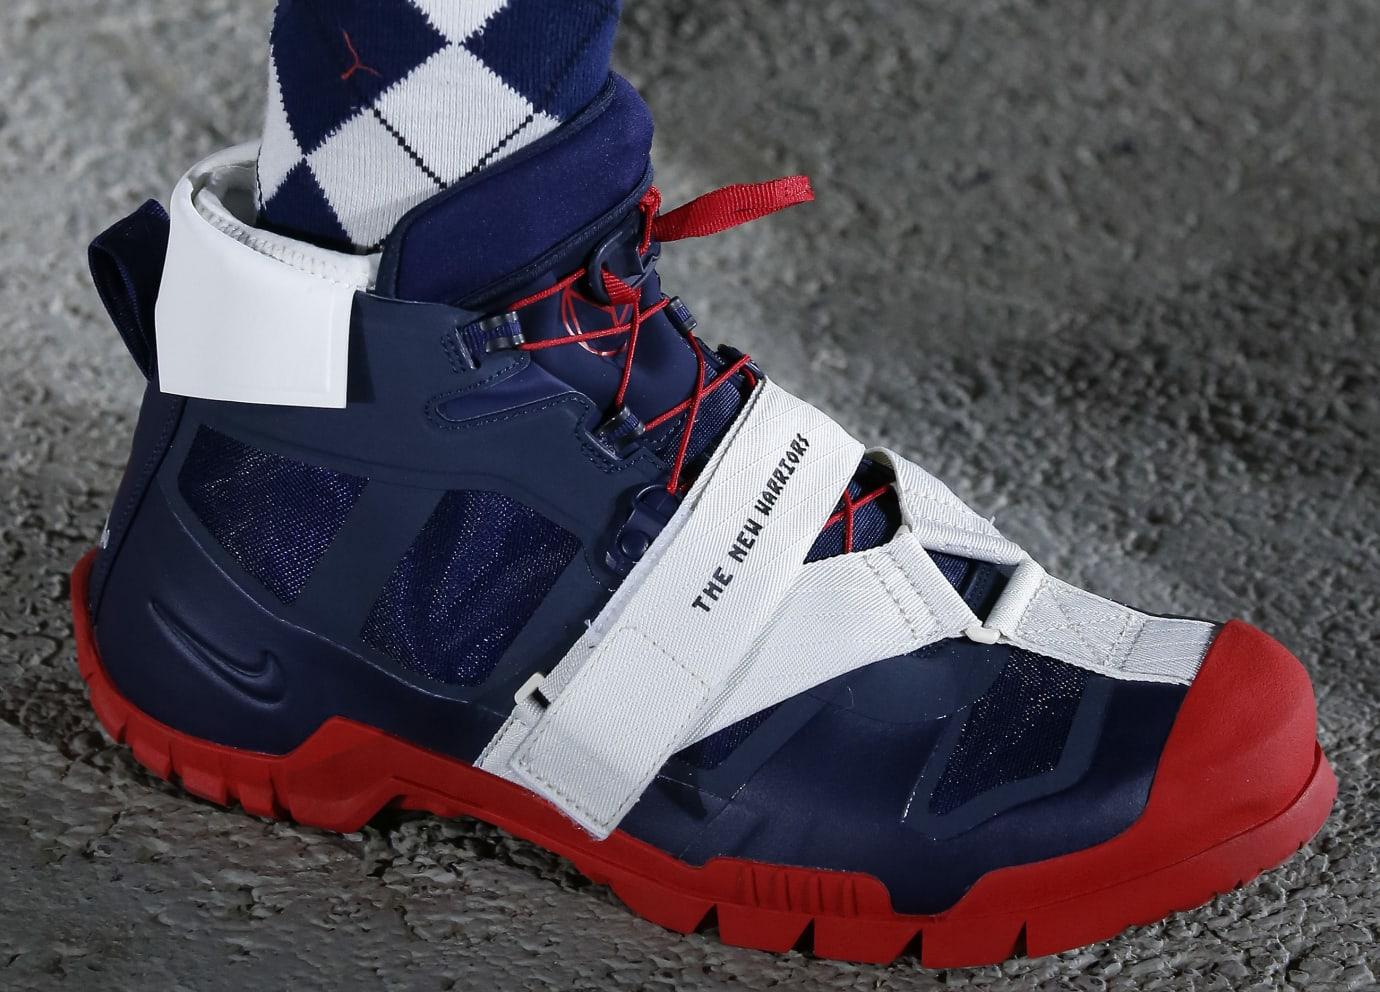 Undercover x Nike Paris Fashion Week Navy/Red High-Top